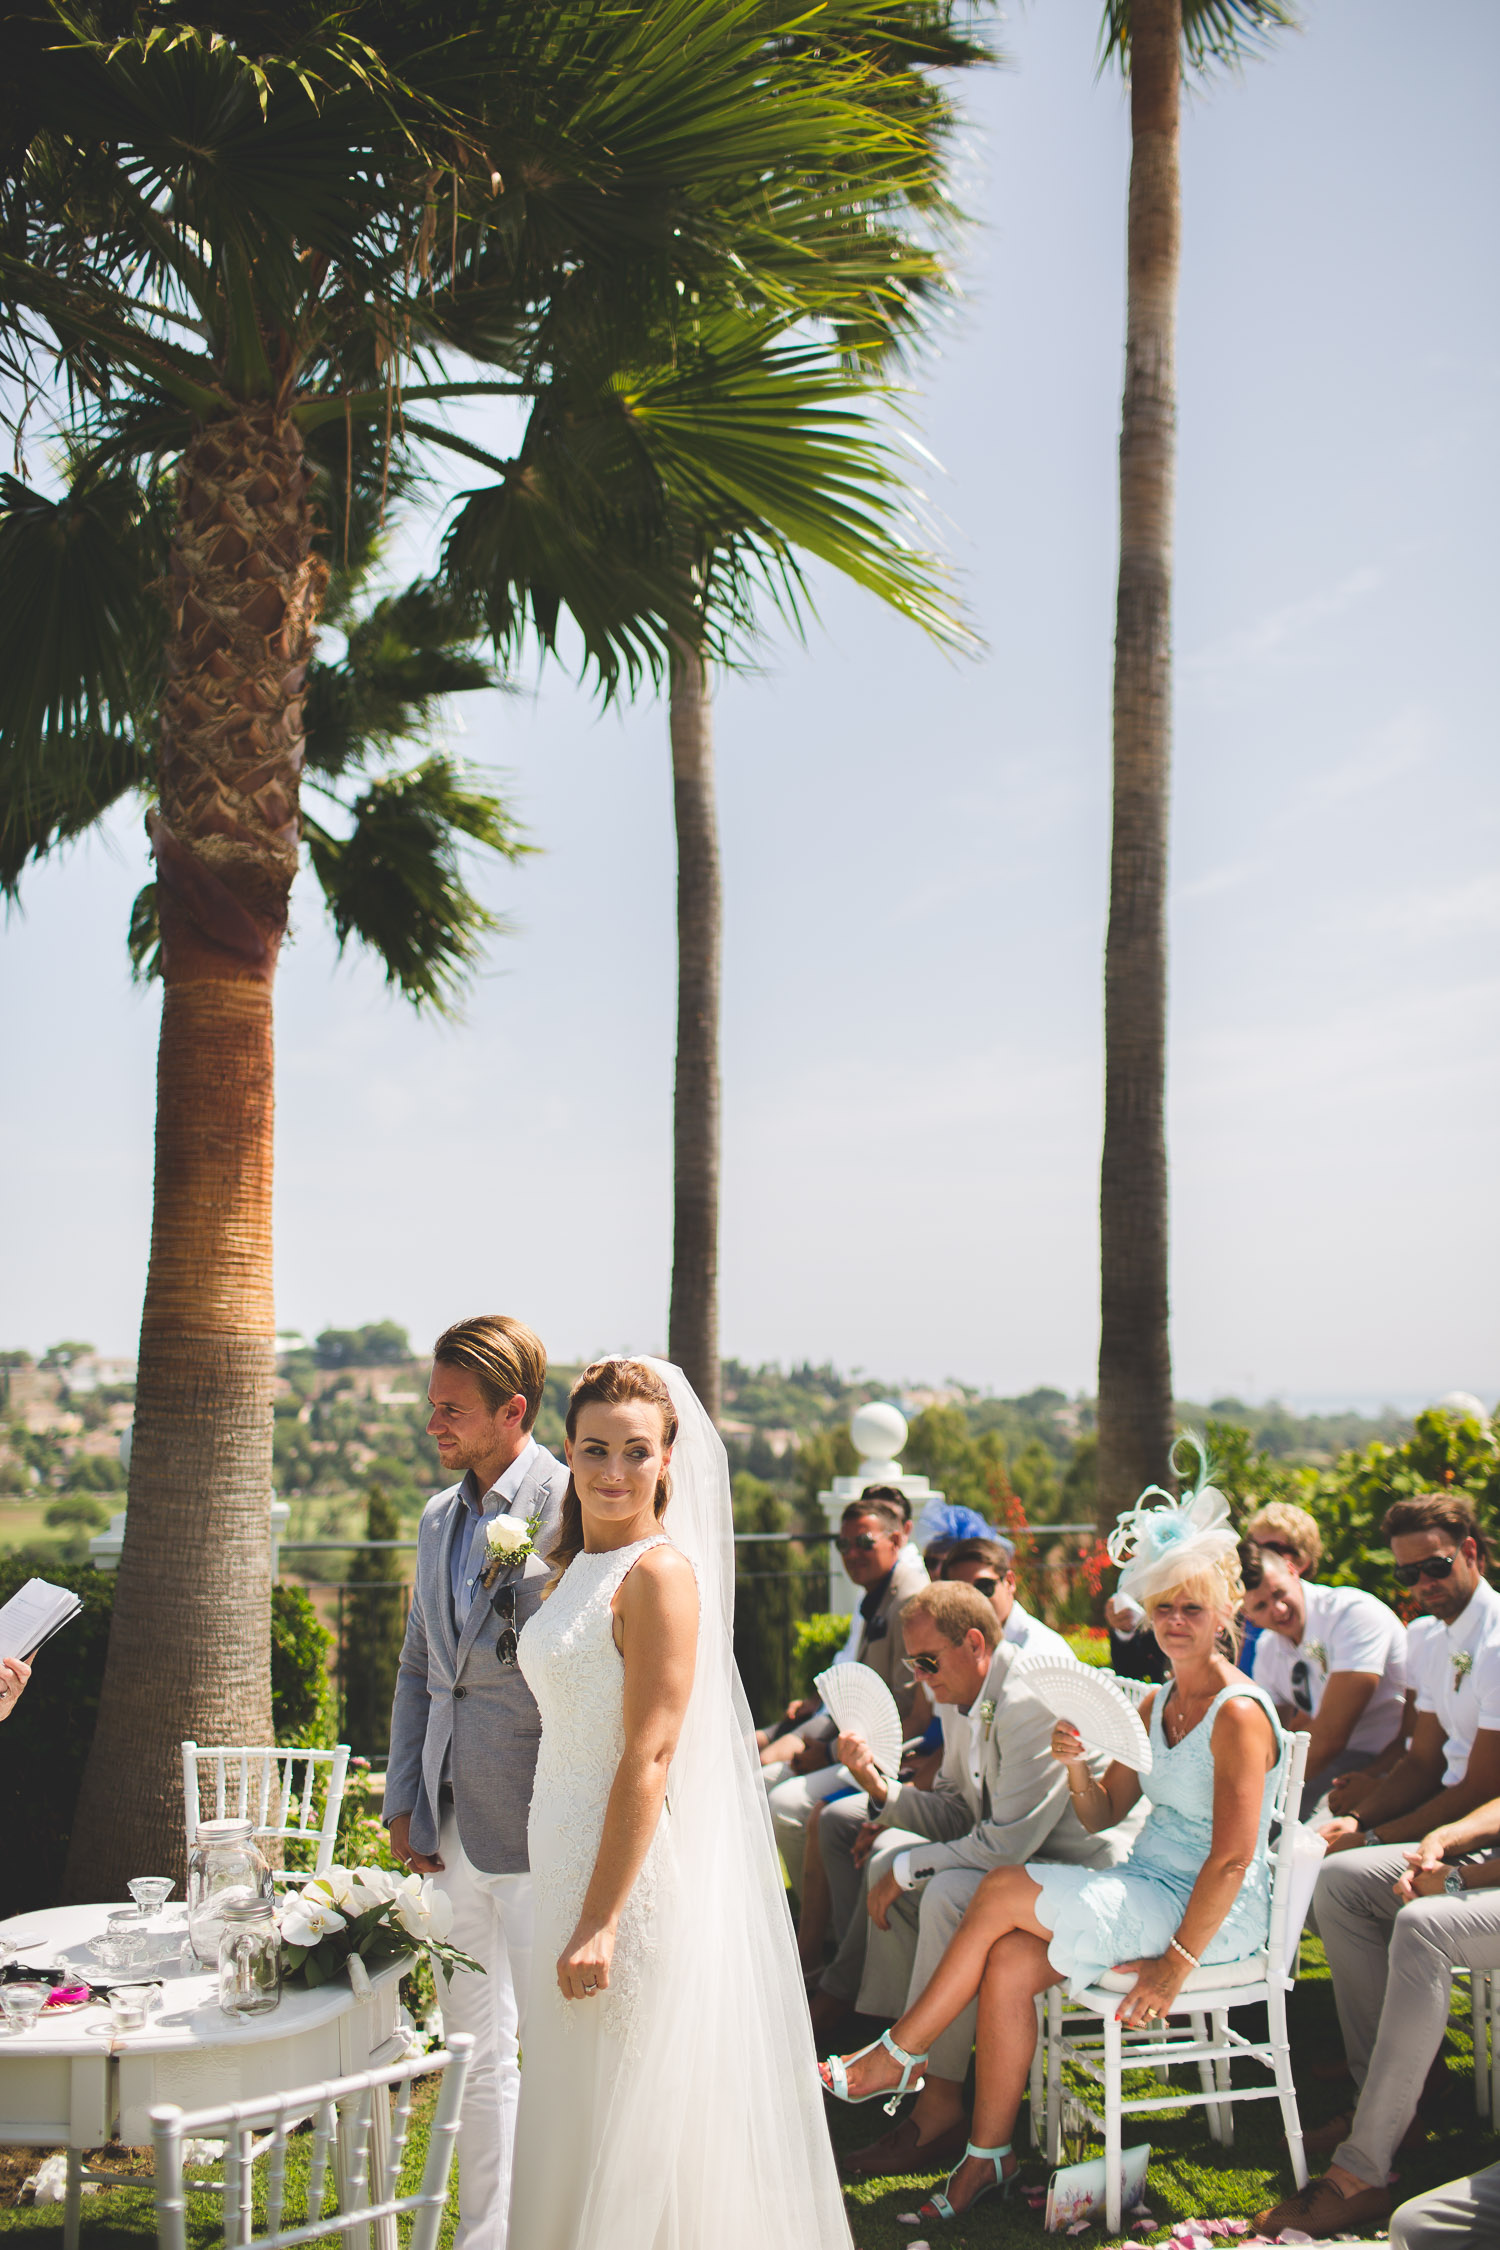 Surrey Wedding Photographer Kit Myers Paige Craig Spain059.jpg